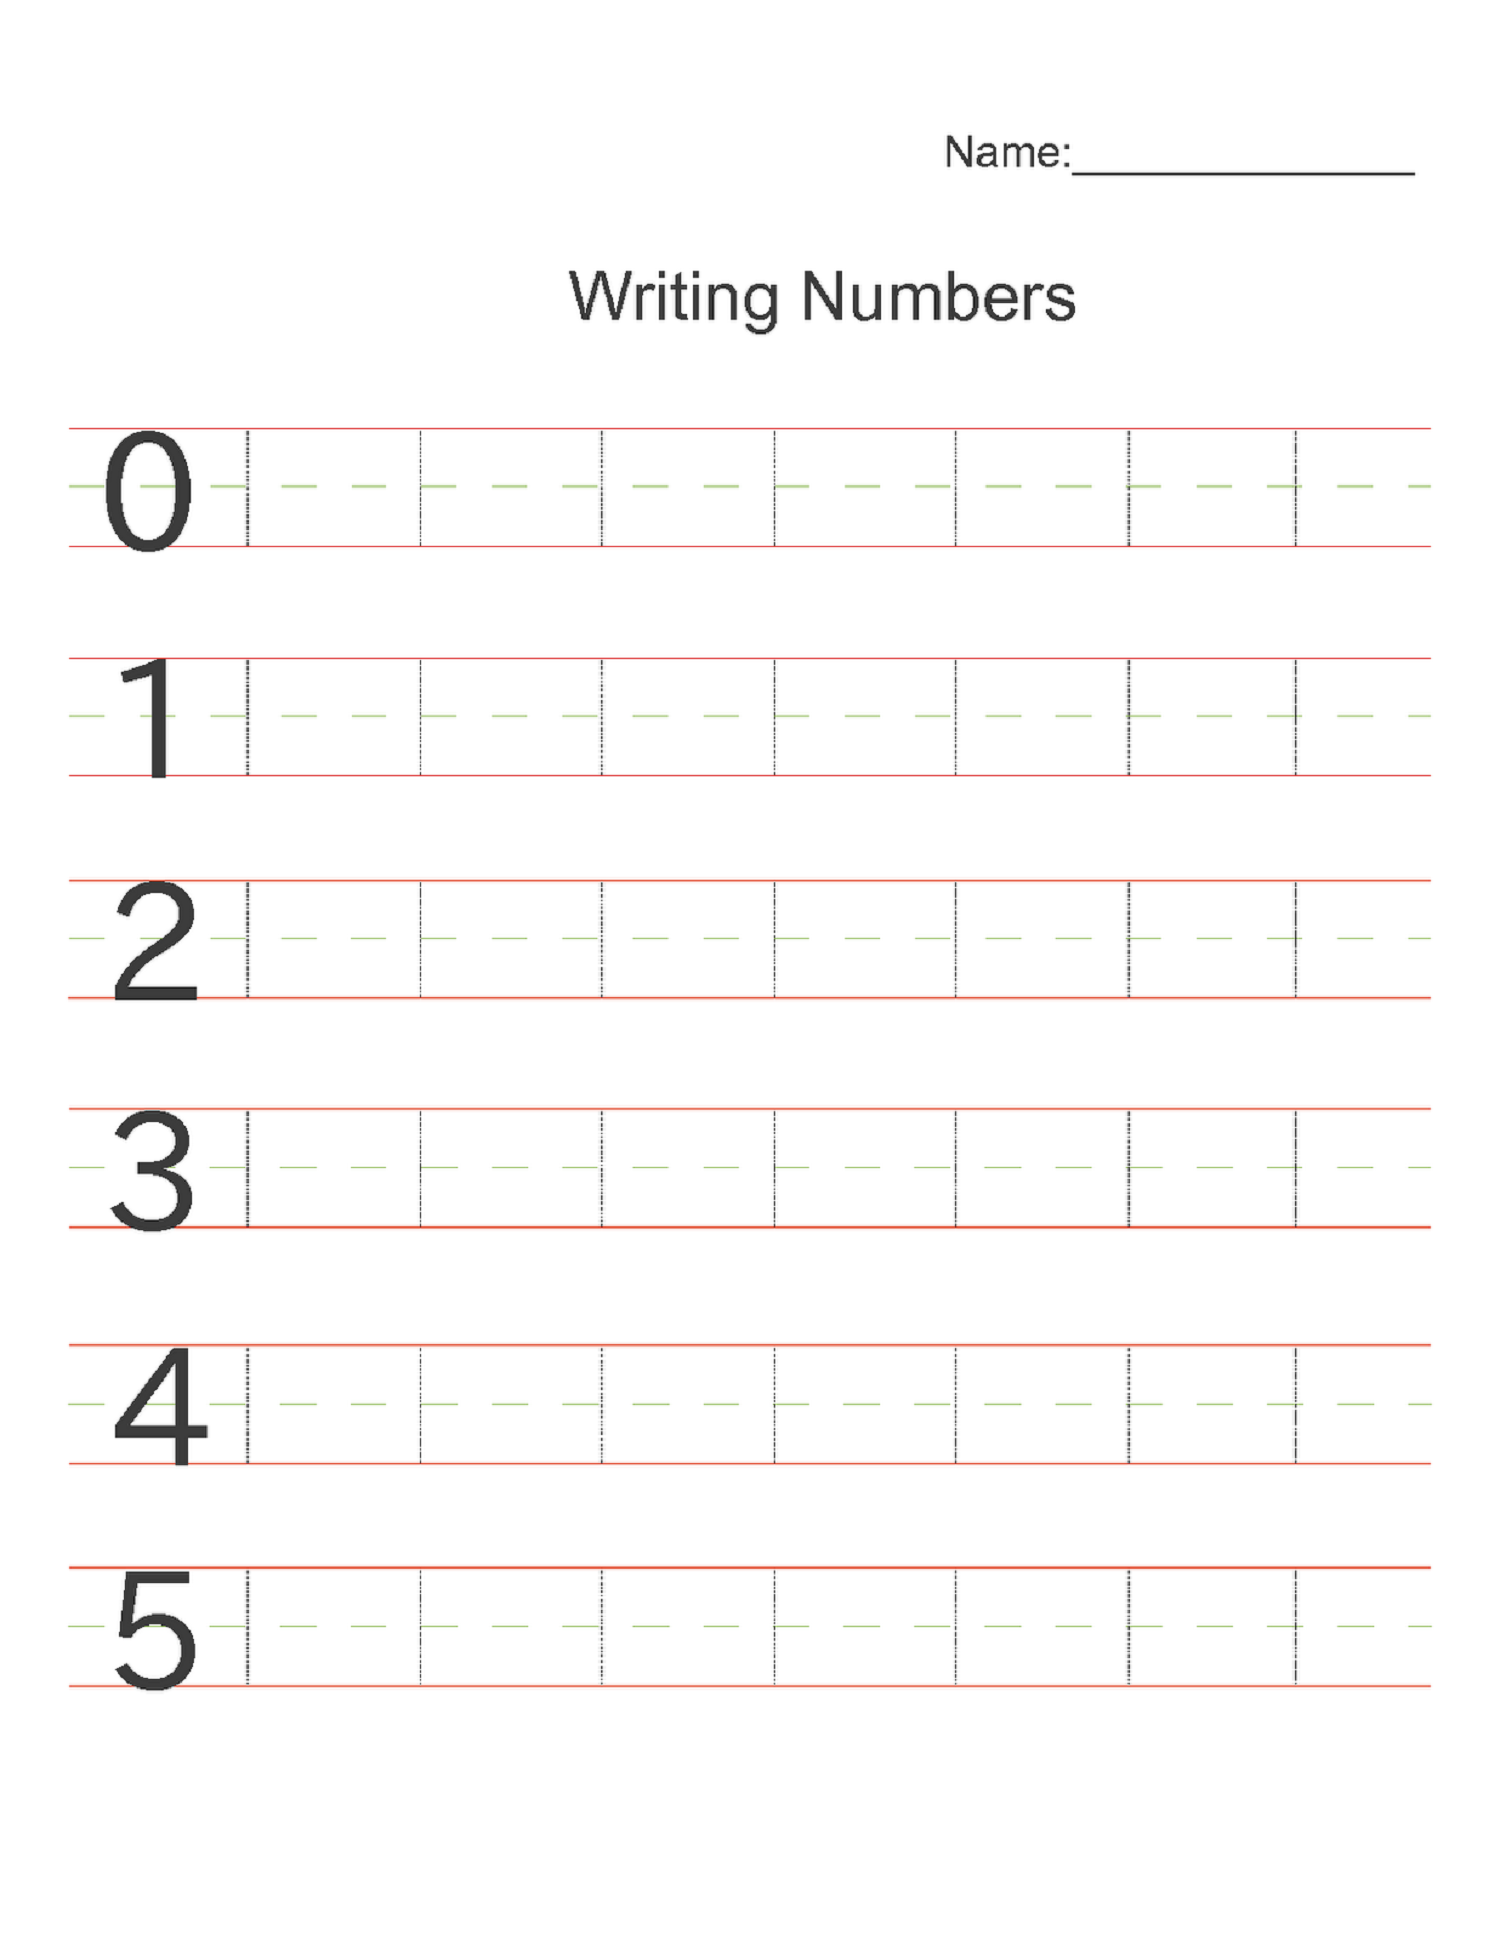 Writing Numbers Worksheet For Basic Mathematics